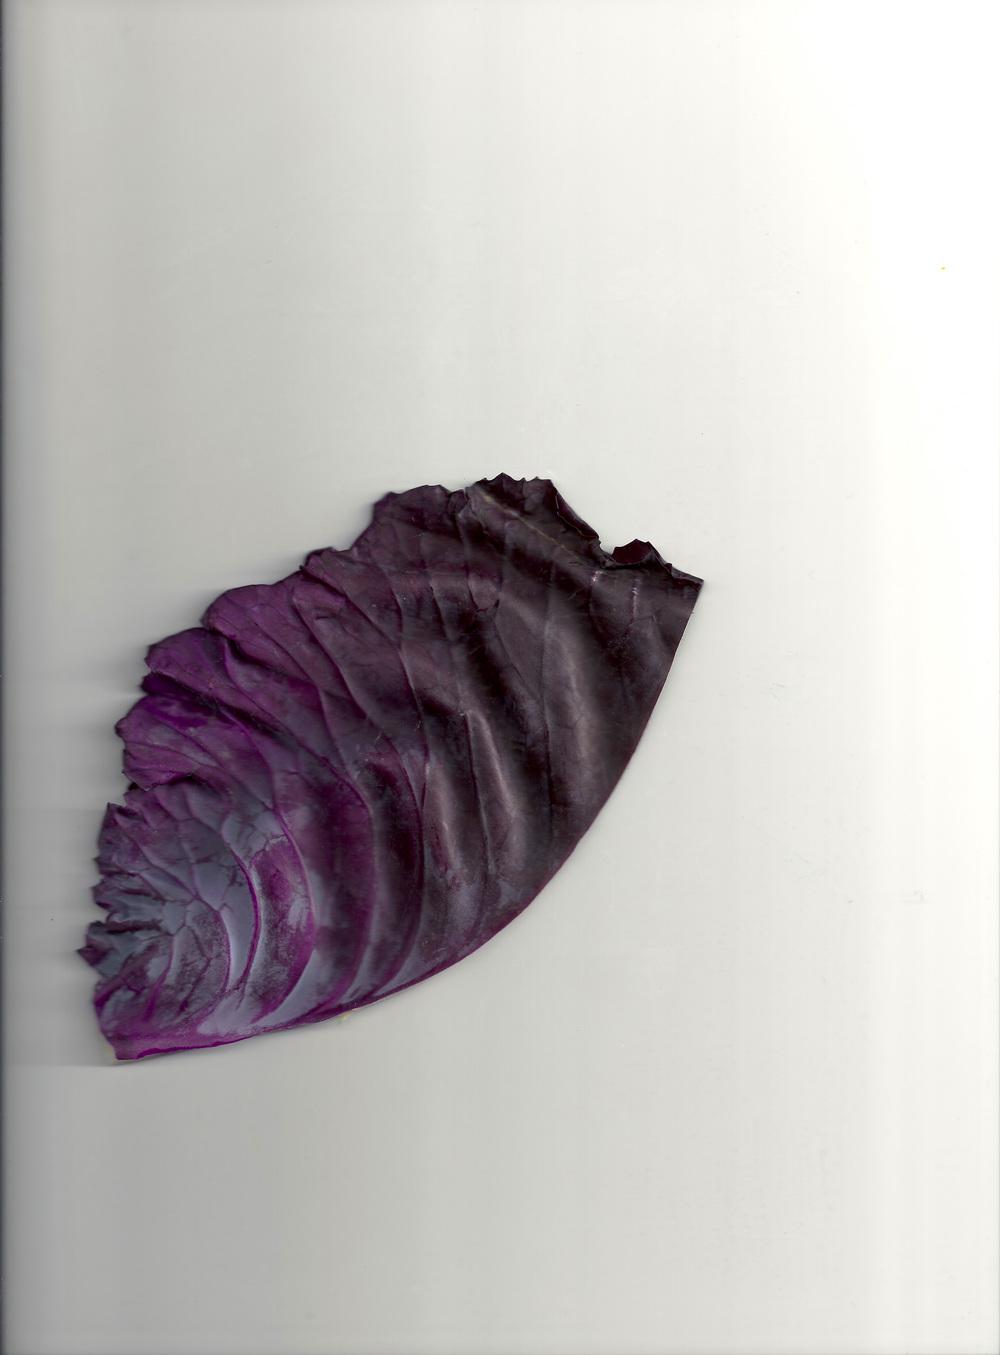 Chou violet 02 .jpg